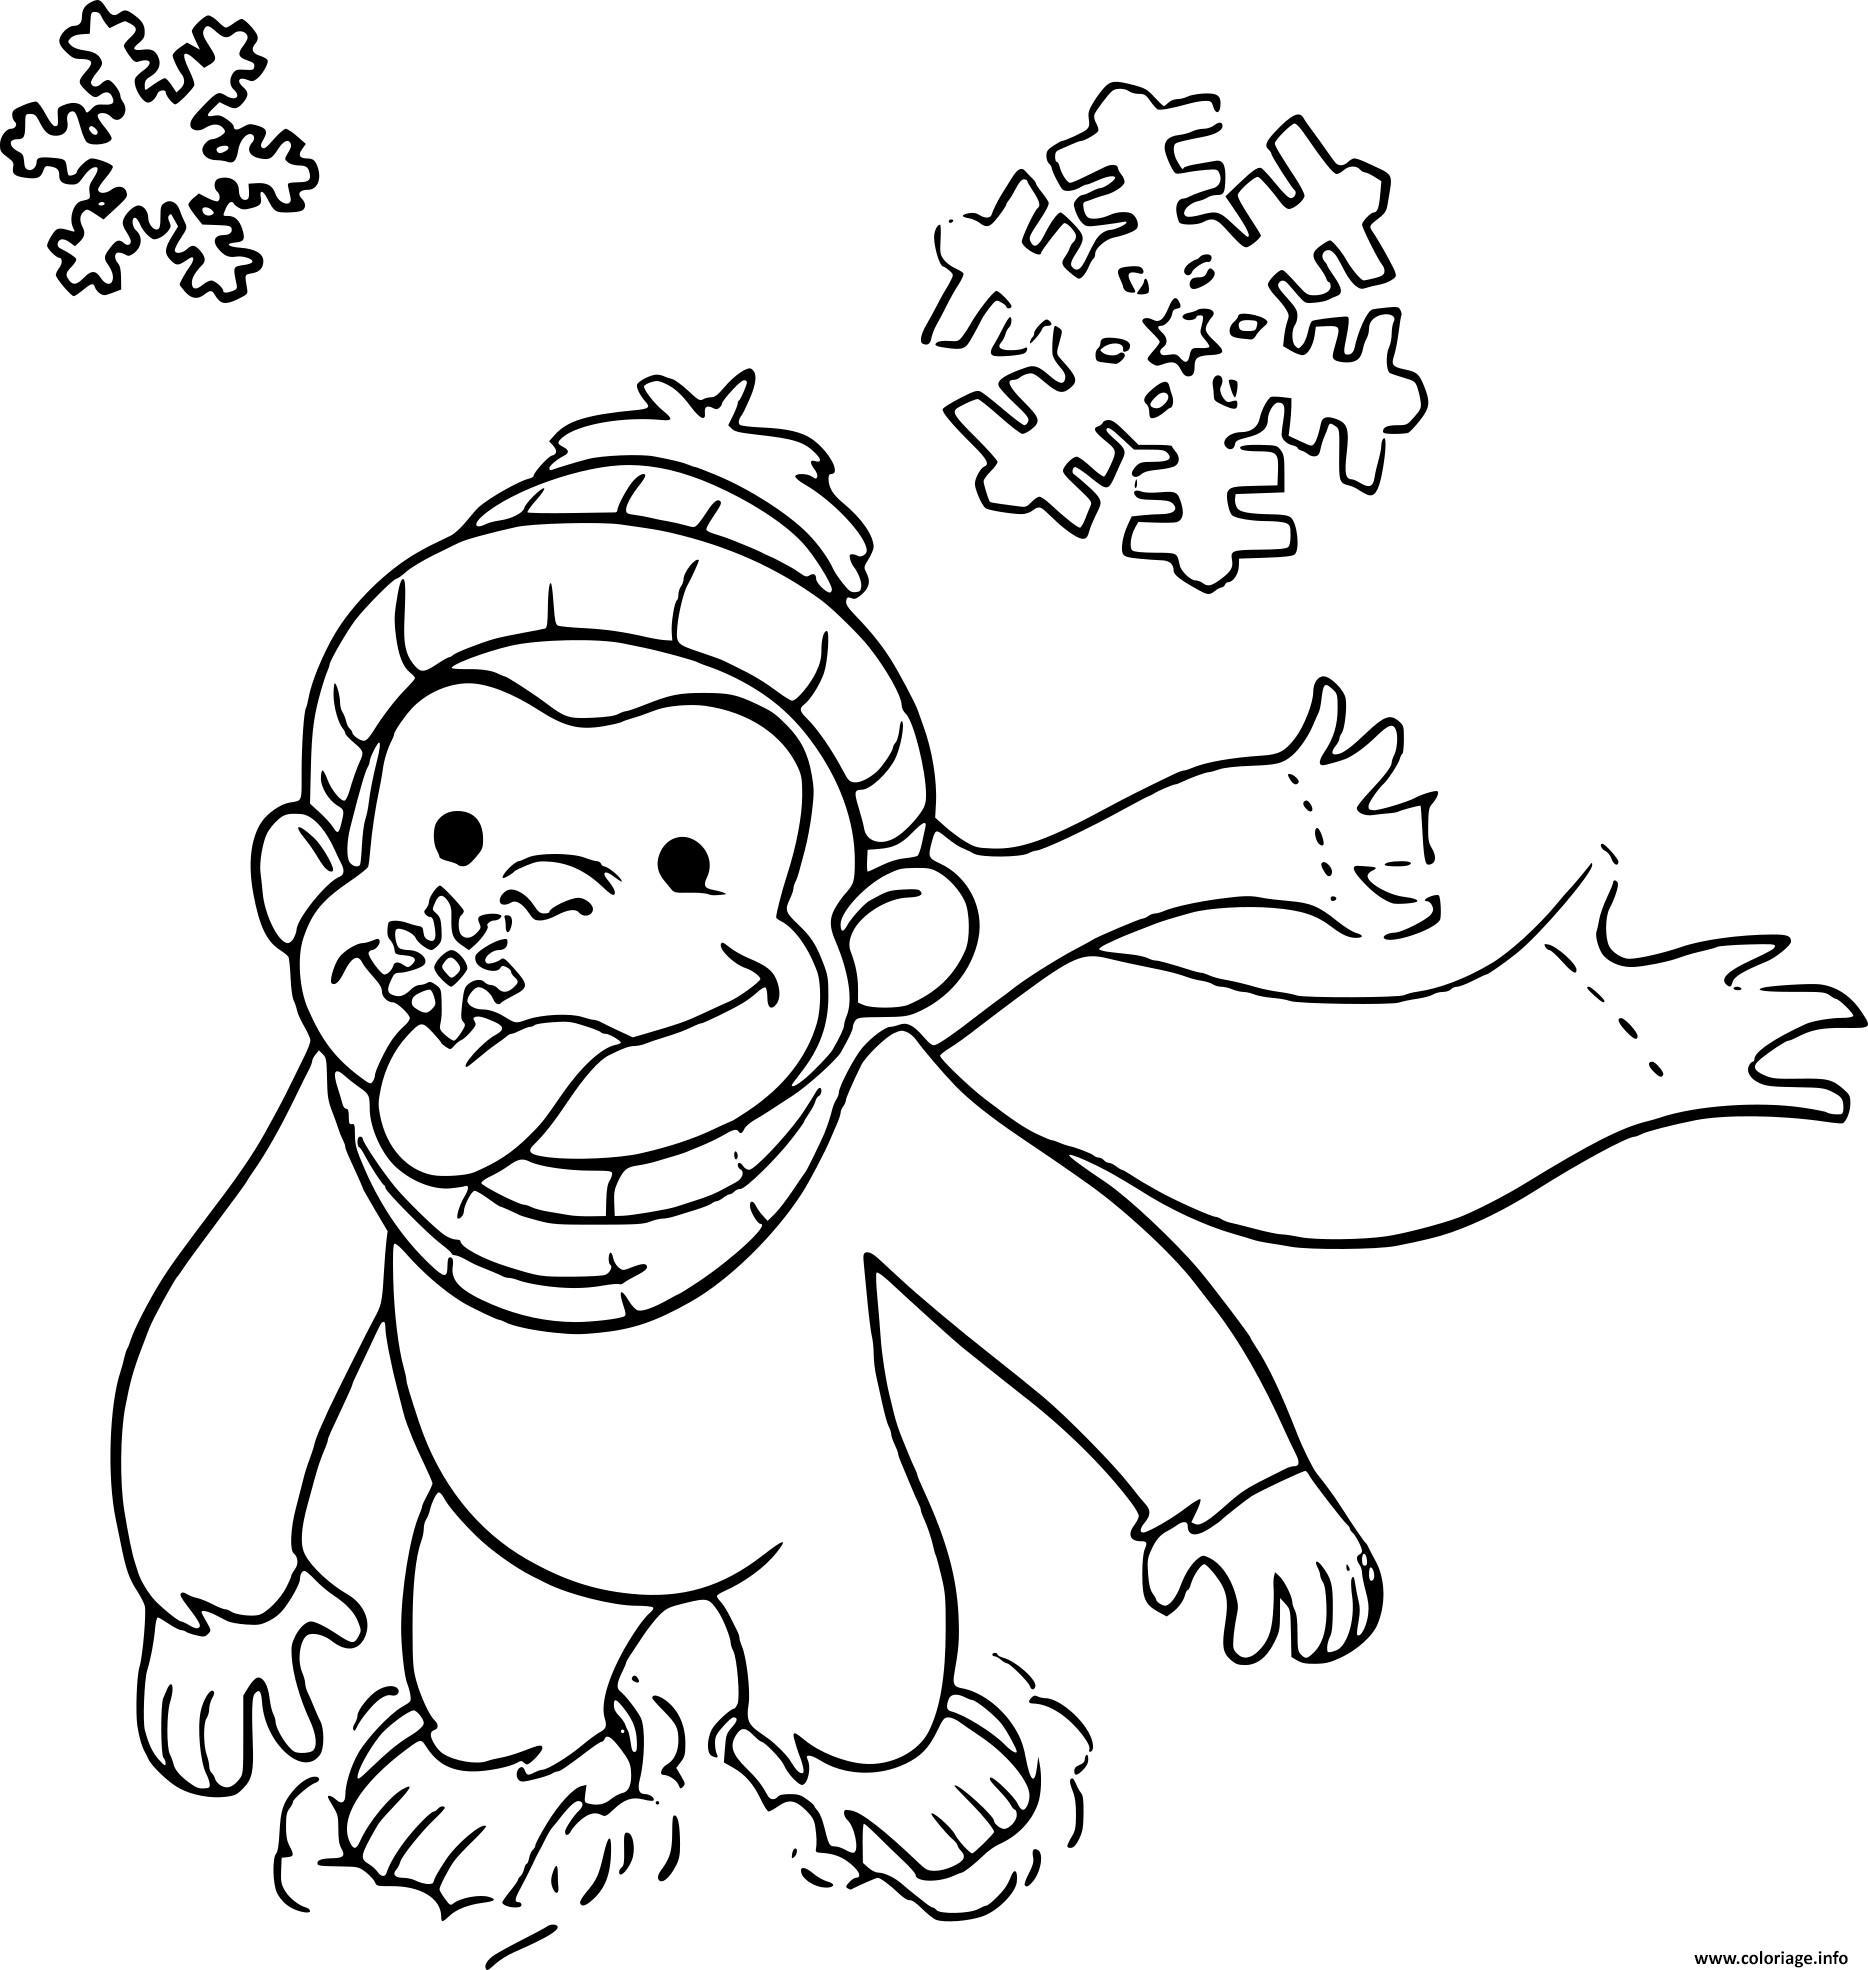 Dessin kawaii a colorier nutella dessin de manga - Comment dessiner un flocon de neige facile ...